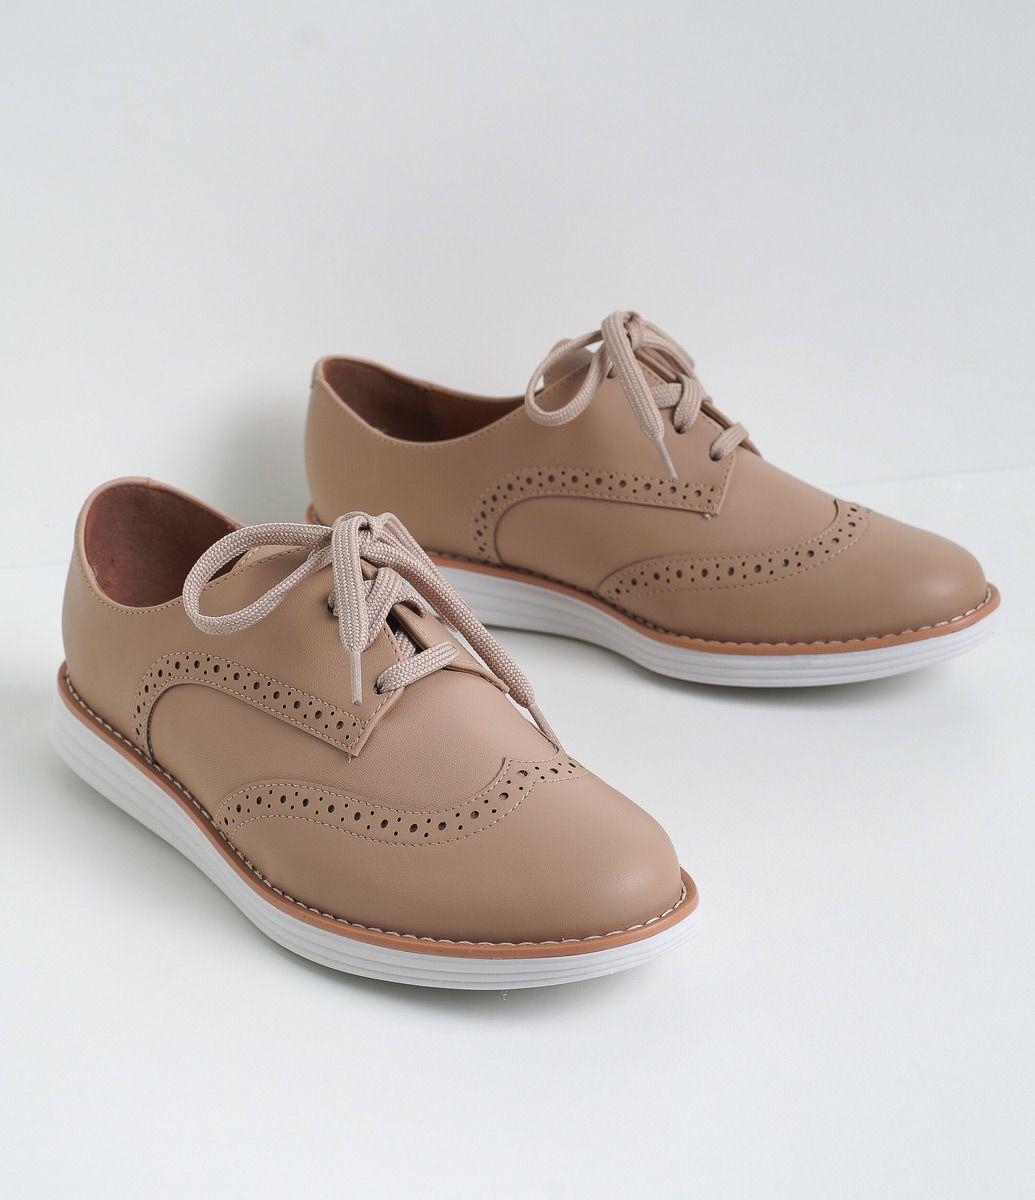 Sapato Feminino Material Sintu00e9tico Oxford Marca Vizzano COLEu00c7u00c3O INVERNO 2016 Veja Outras ...